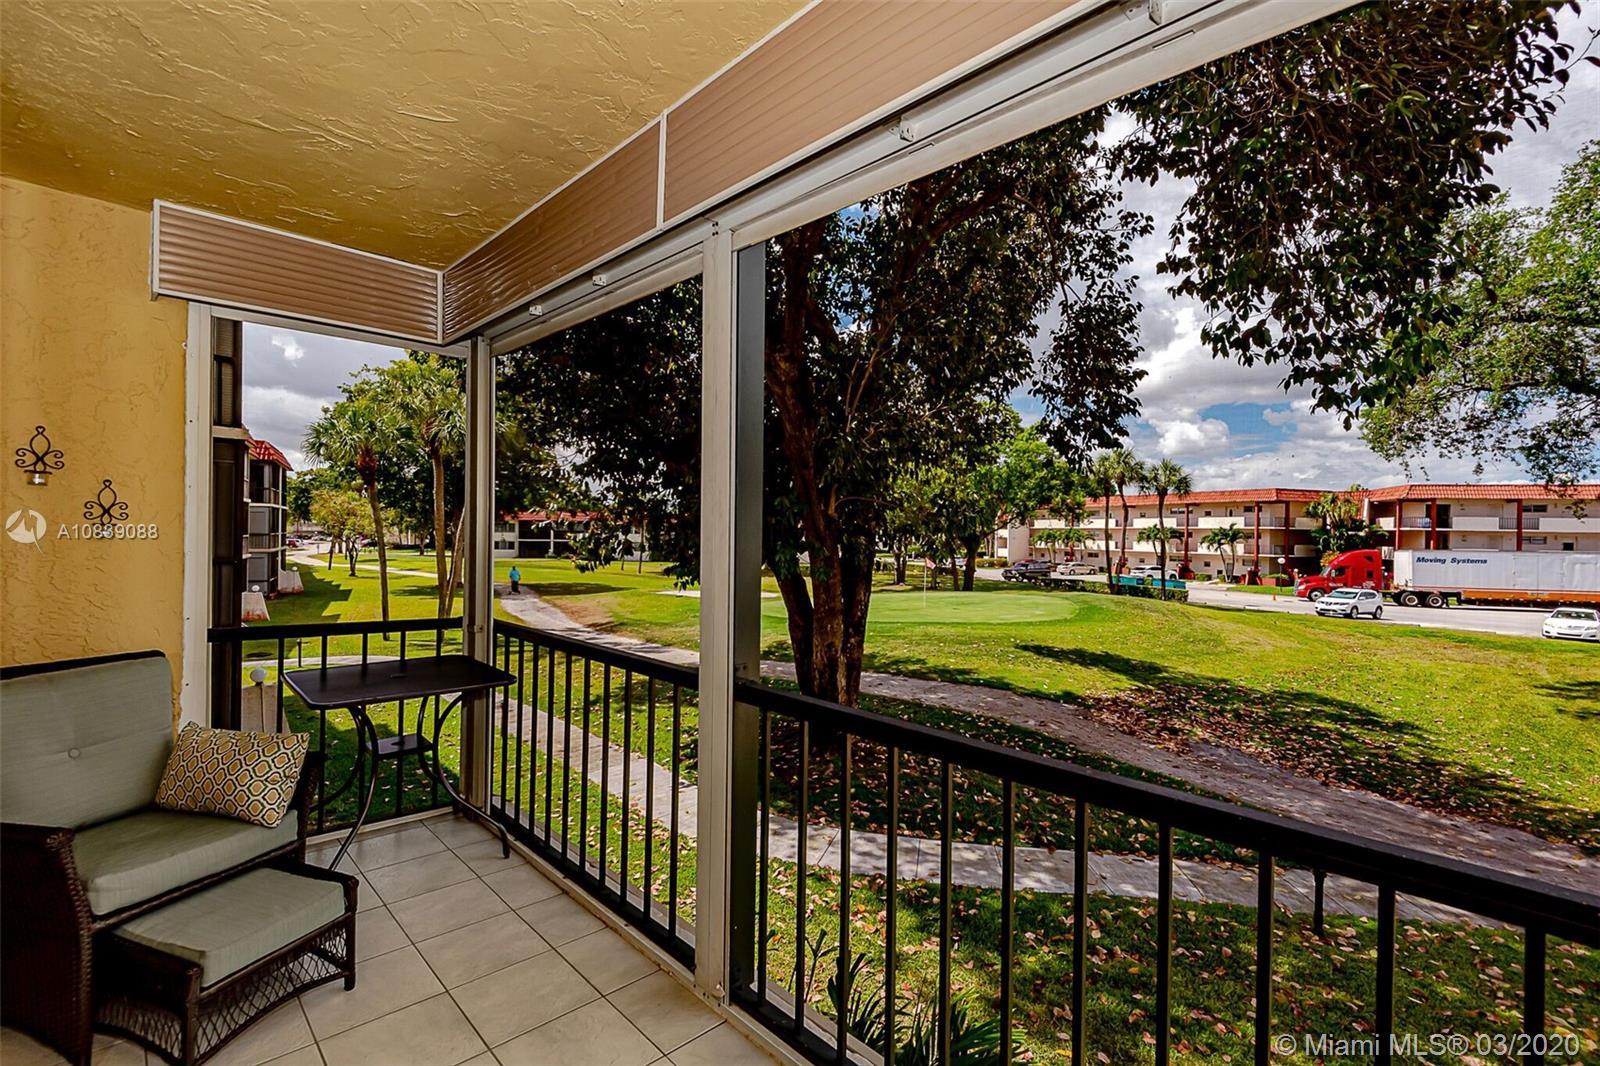 8911 S Hollybrook Blvd # 208, Pembroke Pines, Florida 33025, 2 Bedrooms Bedrooms, ,2 BathroomsBathrooms,Residential,For Sale,8911 S Hollybrook Blvd # 208,A10839088